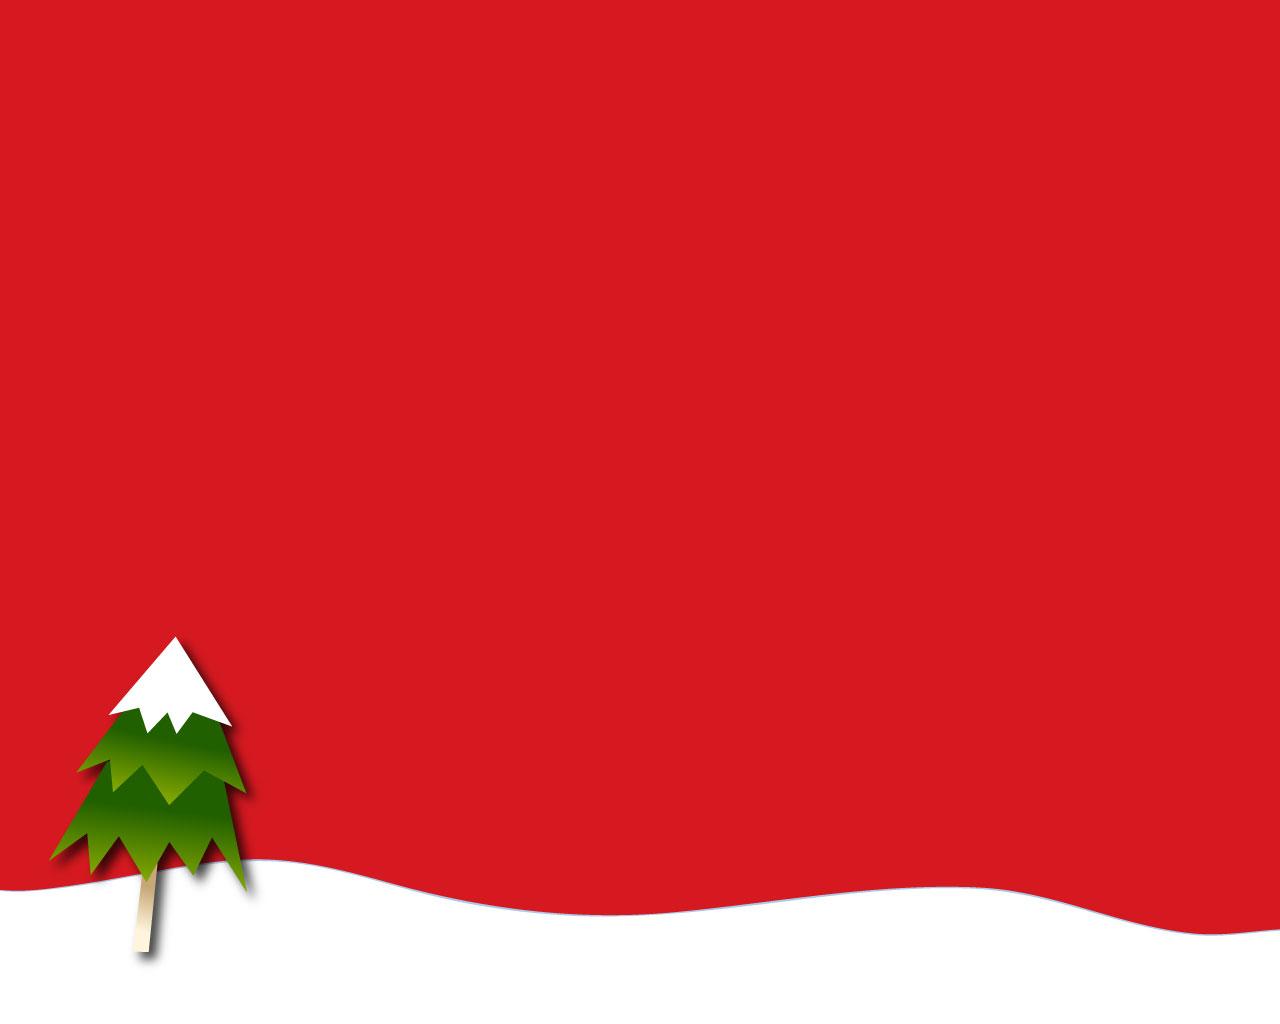 Christmas Clip Art merry christmas clip art free – Search Wallpaper ...